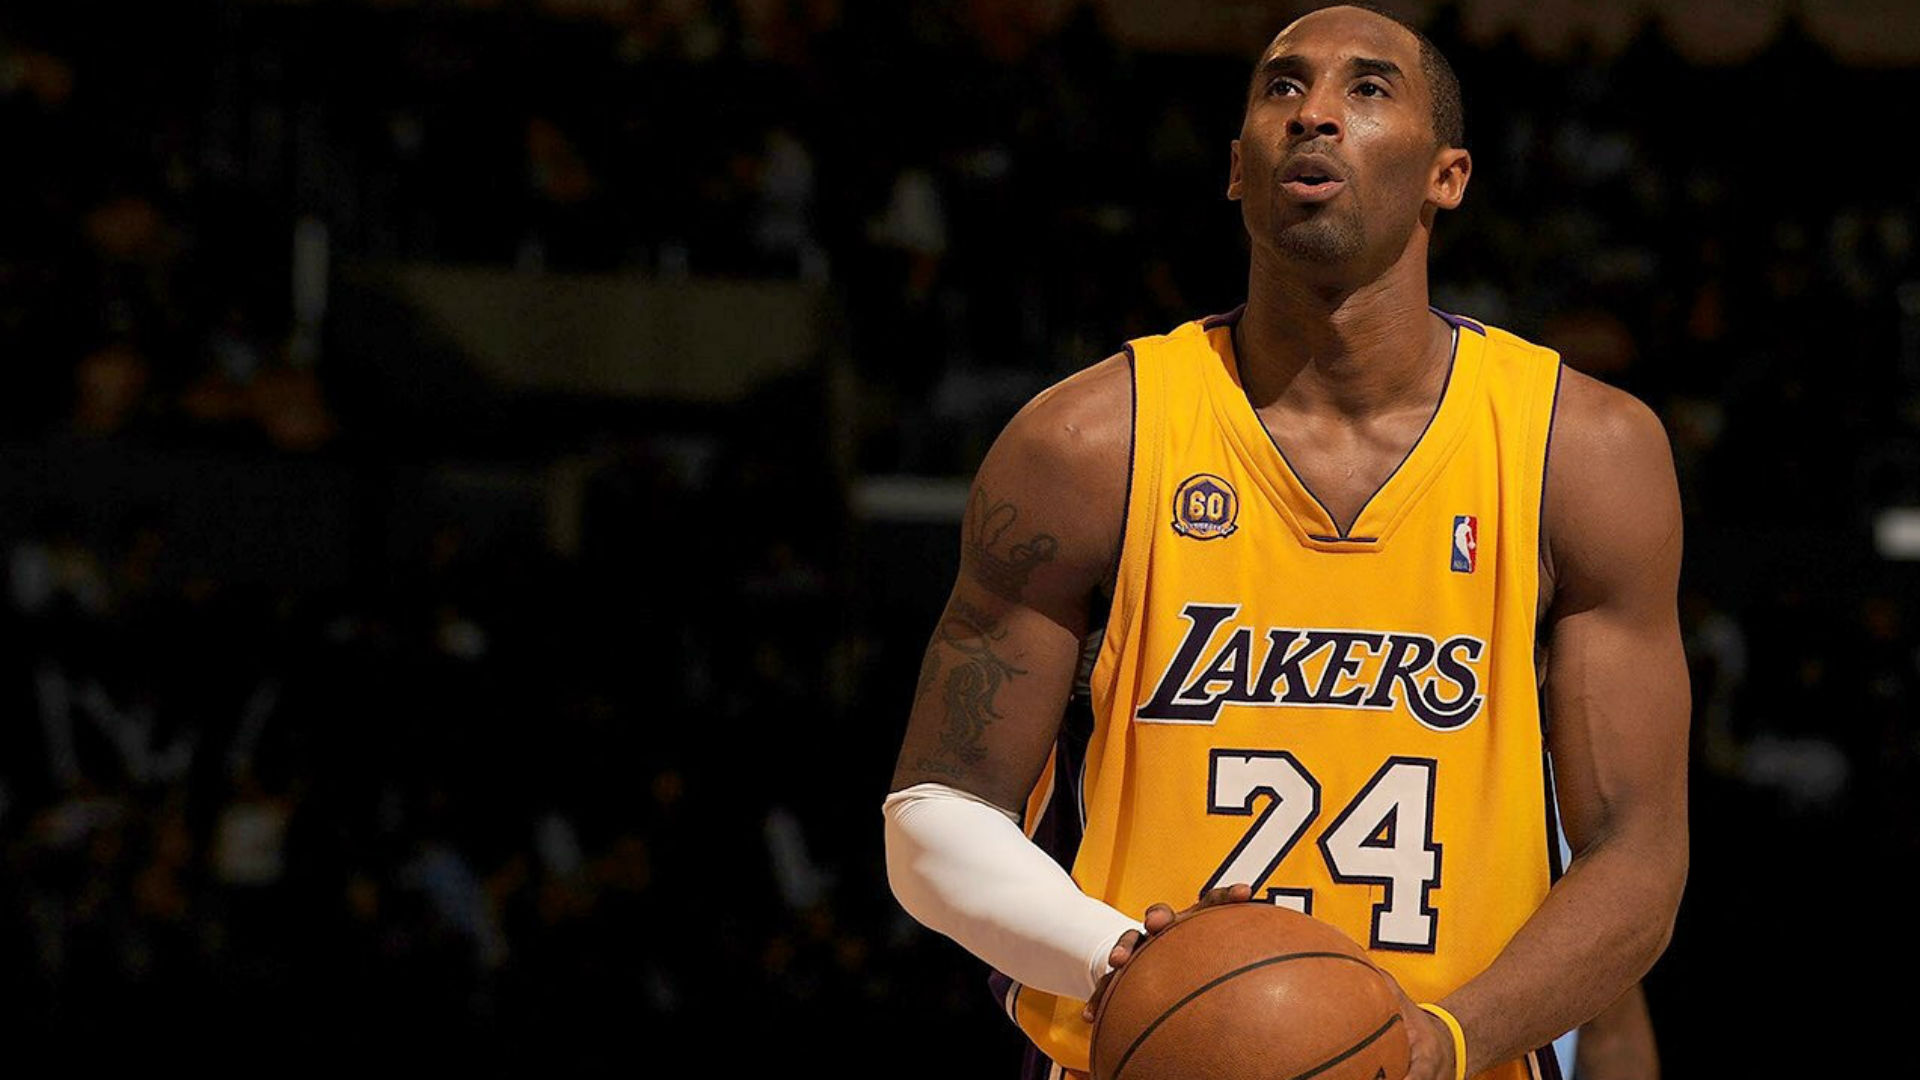 Adebayo Akinfenwa pays heartfelt tribute to Kobe Bryant